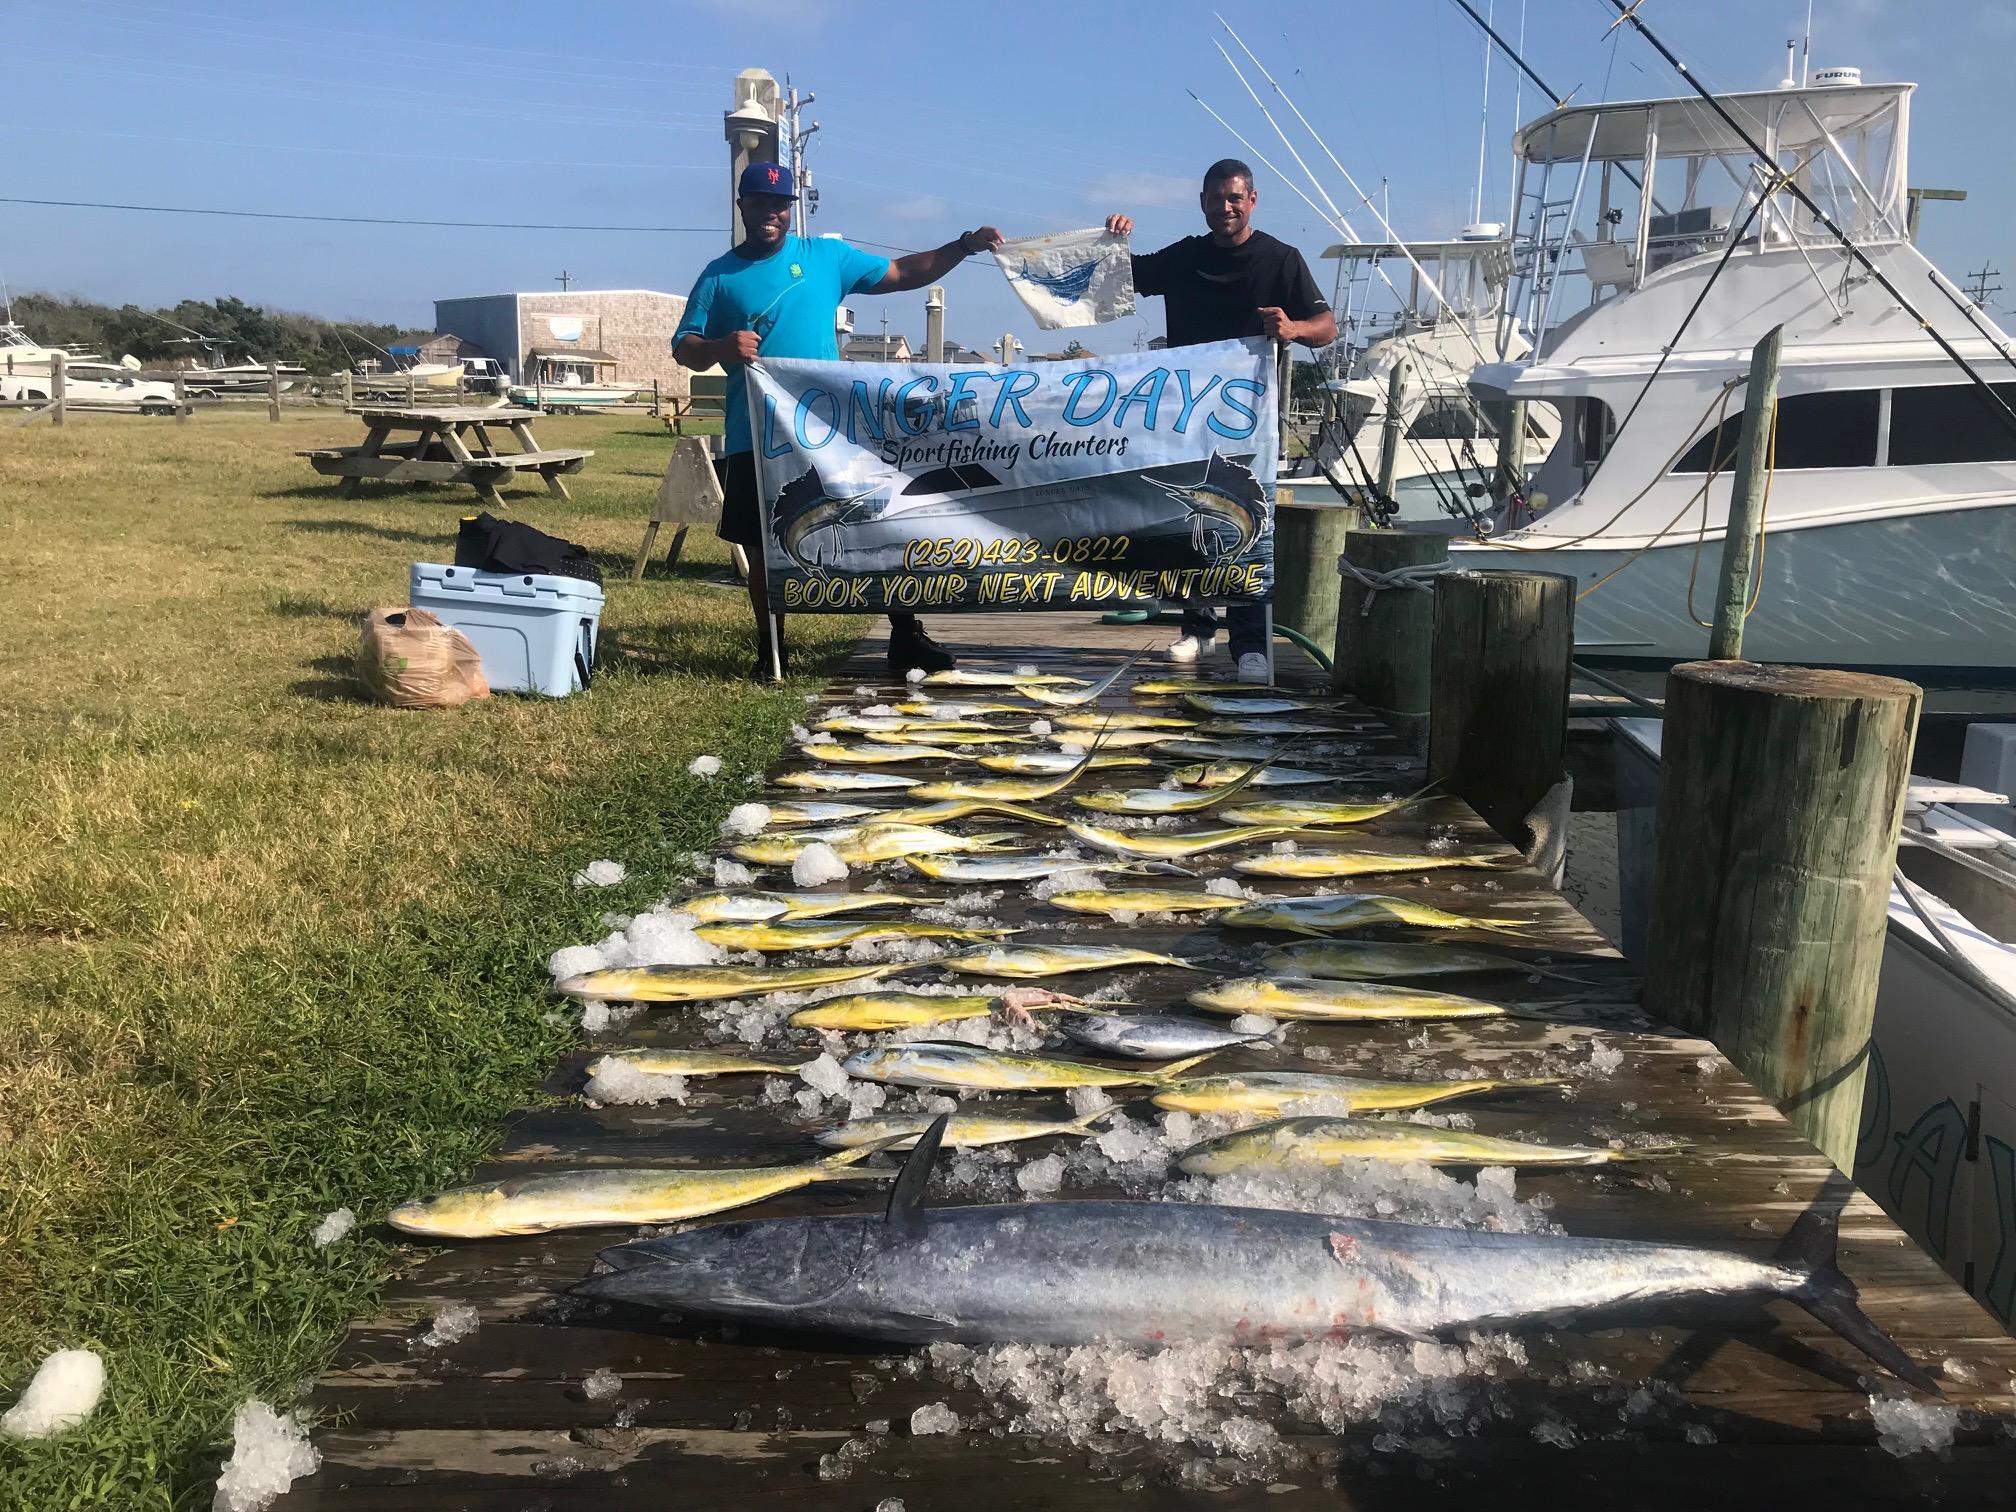 Longer Days Offshore Fishing Teach's Lair Marina OBX Hatteras